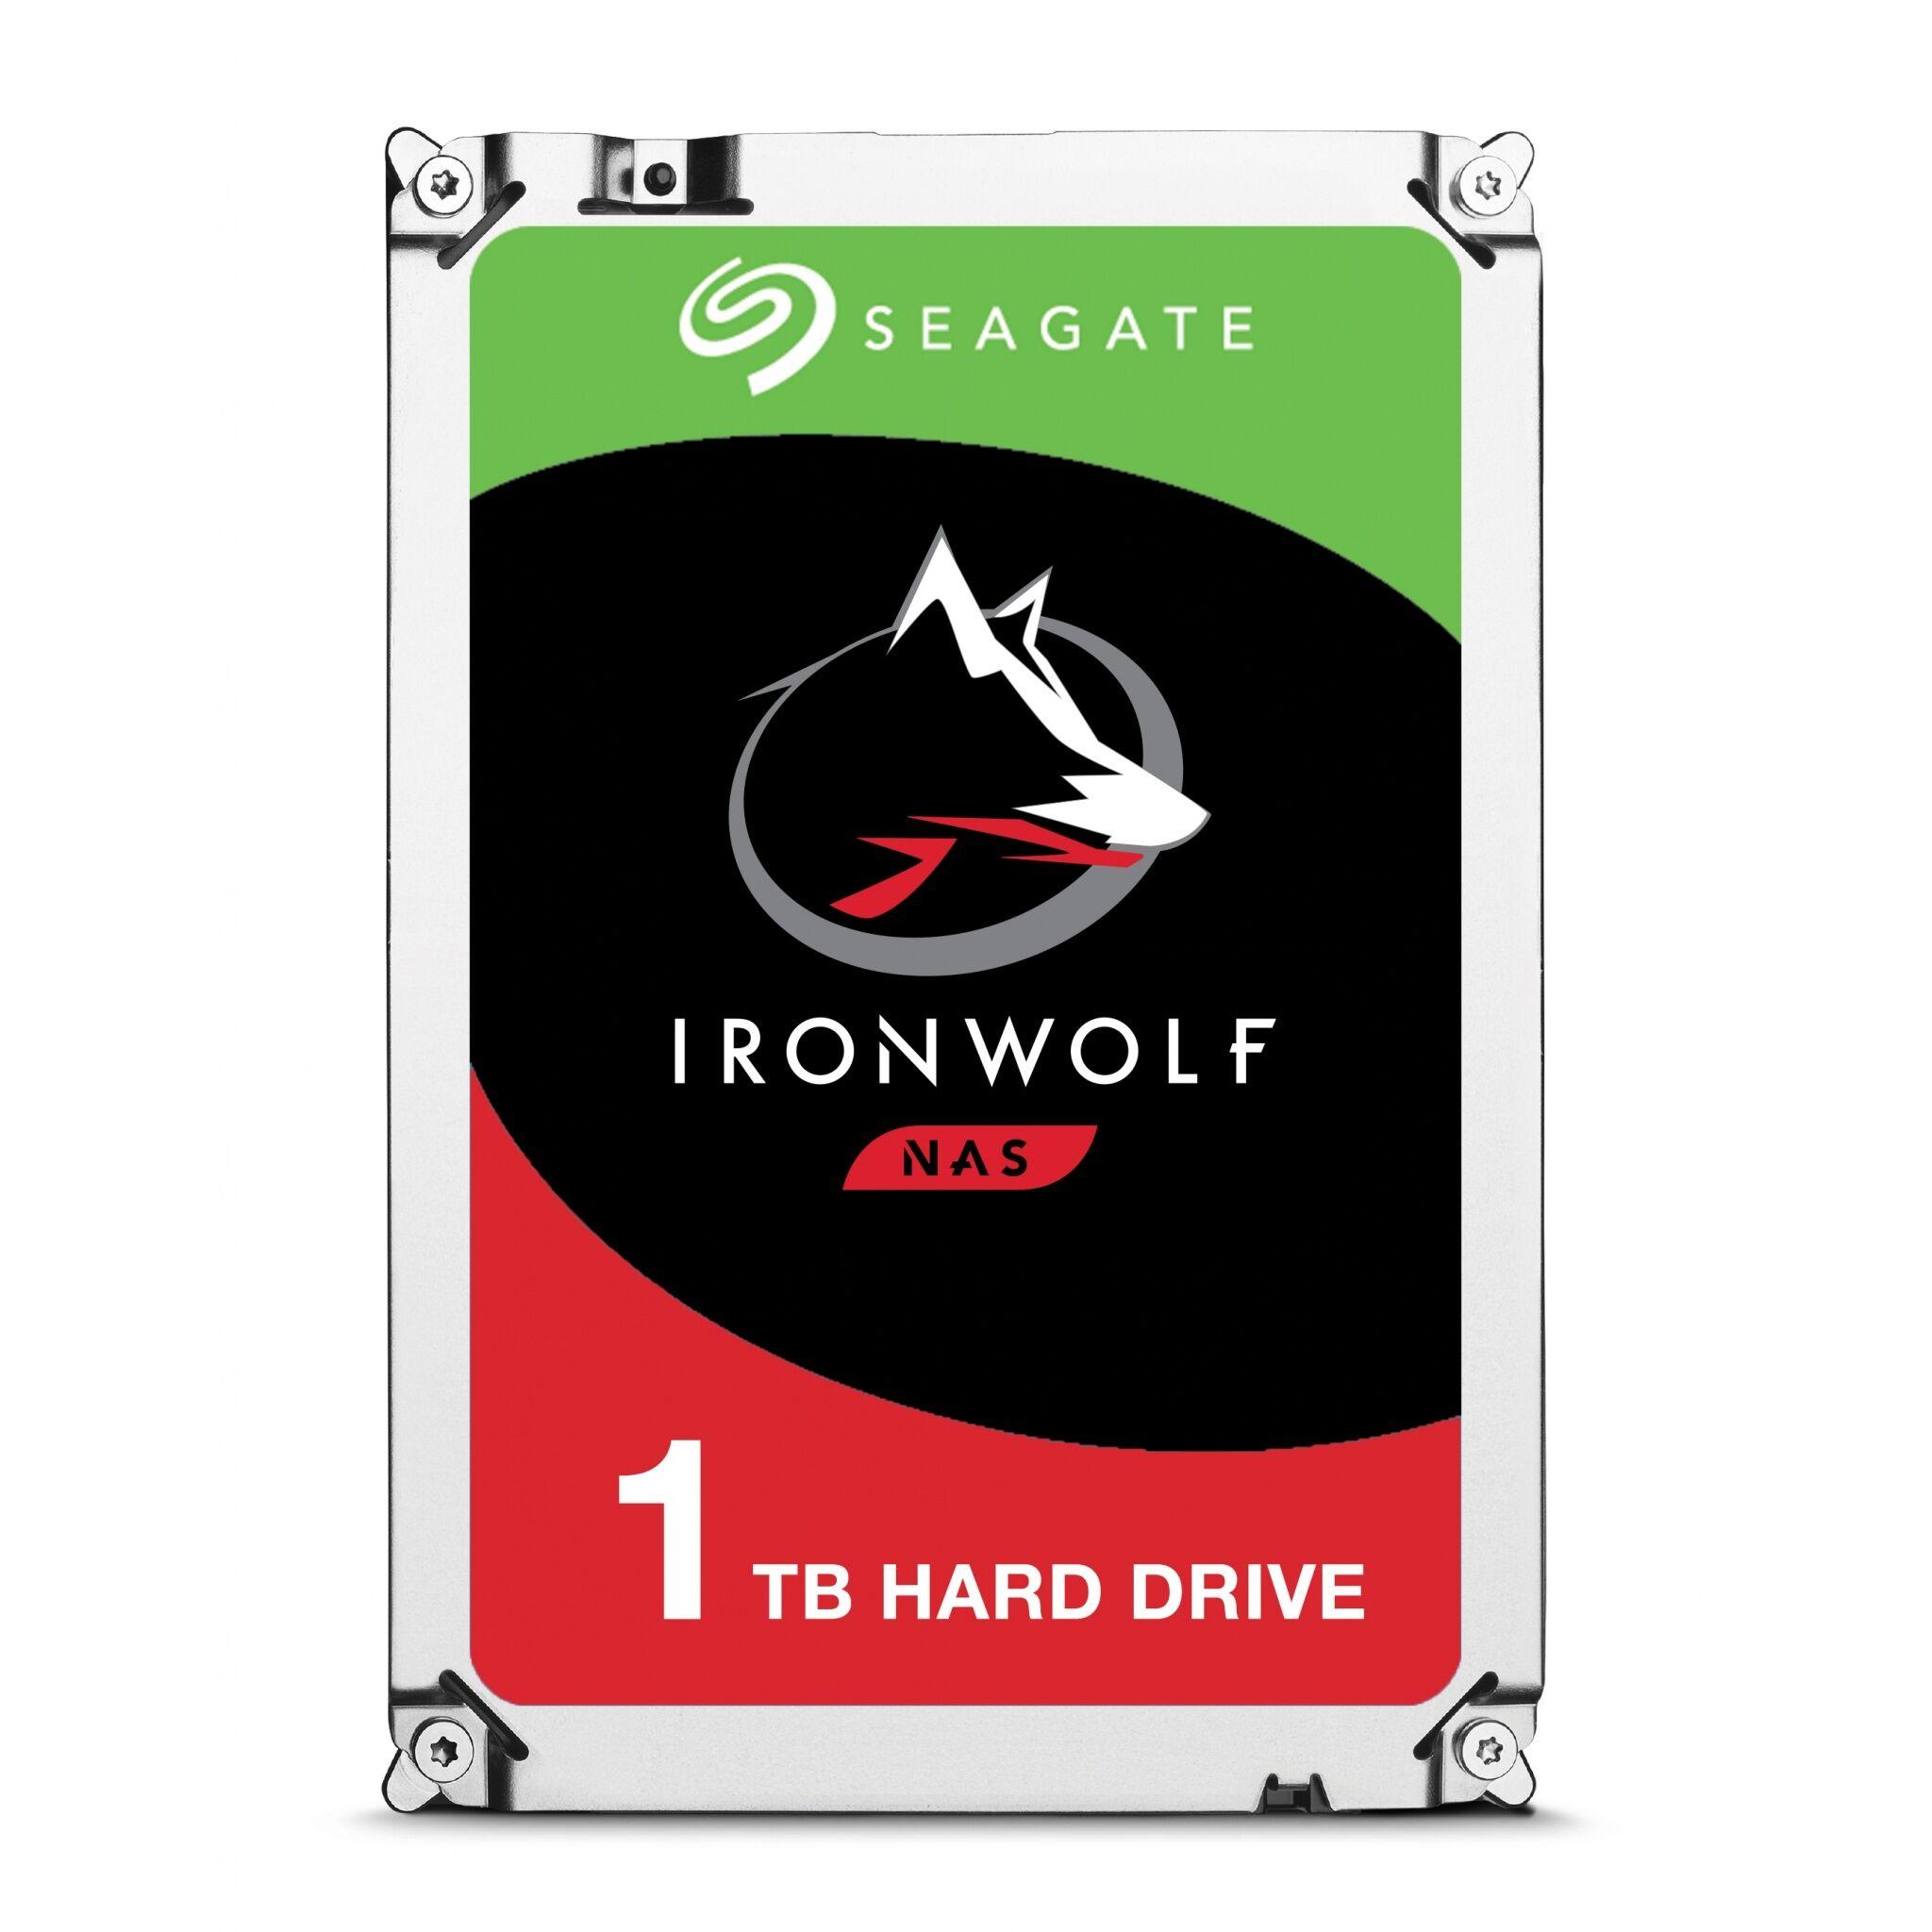 Seagate 1TB Seagate IronWolf 3.5-inch 5900RPM SATA III 6Gbps 64MB Cache Internal Hard Drive